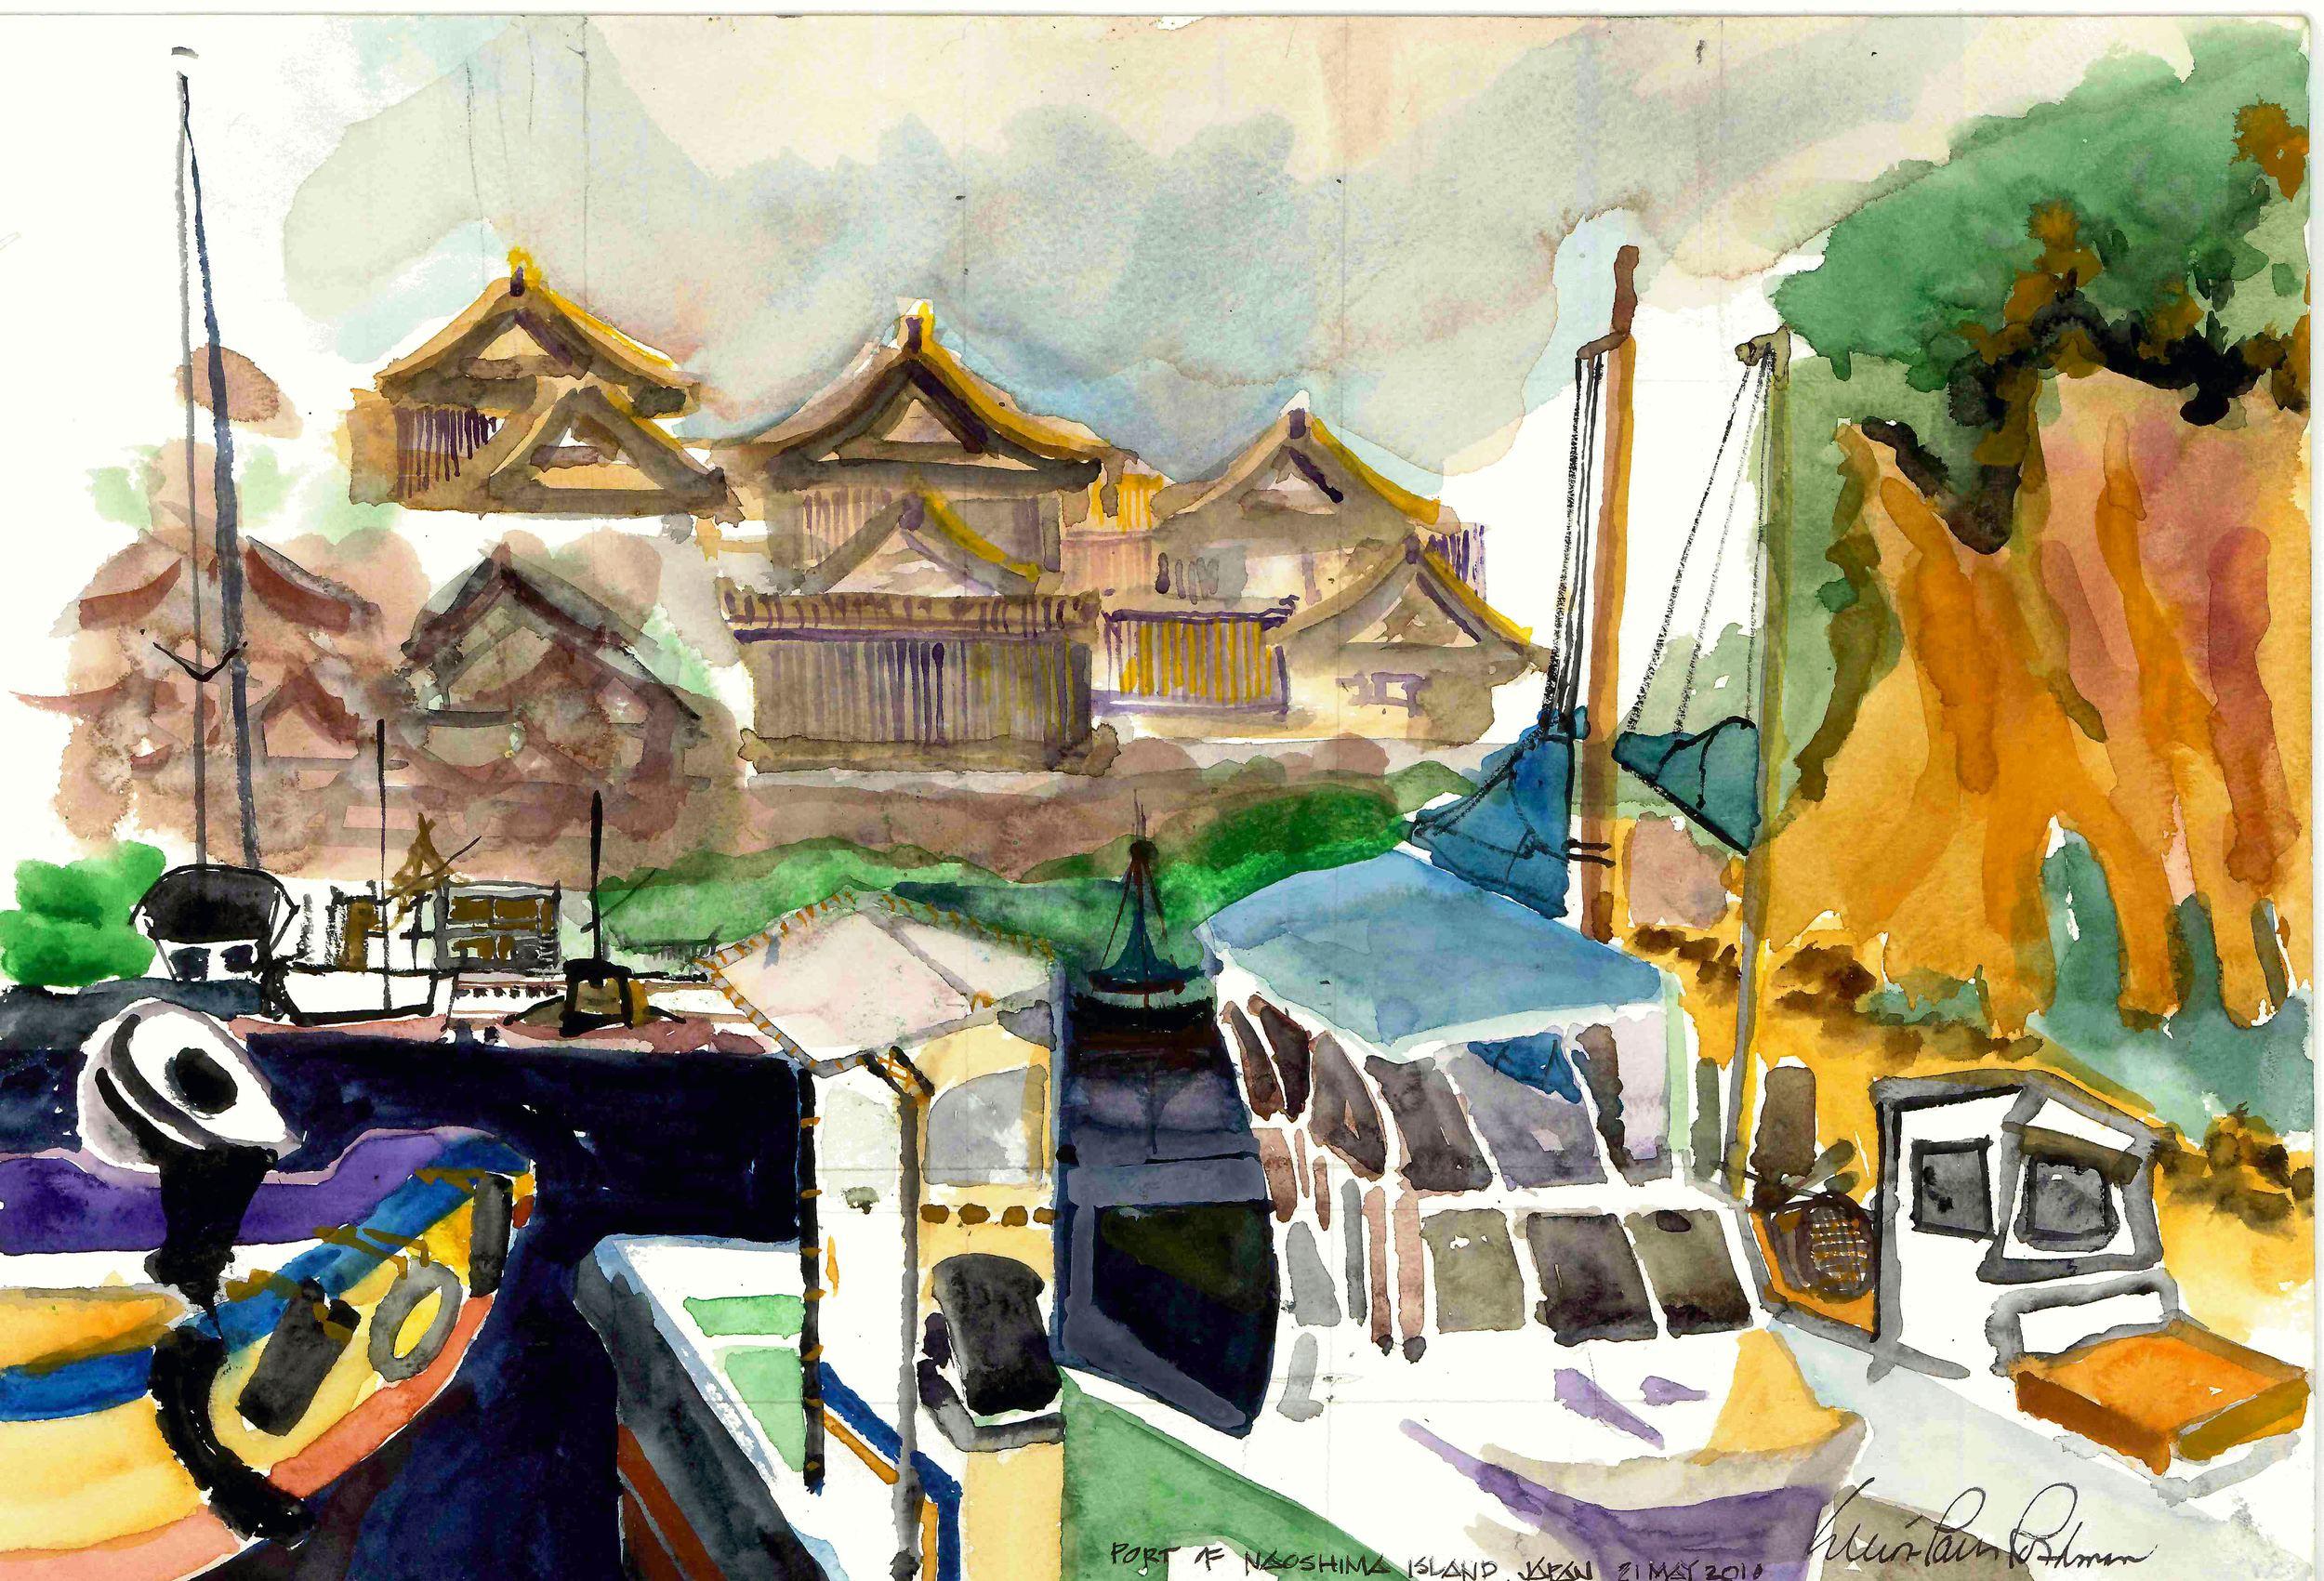 Port of Naoshima Island